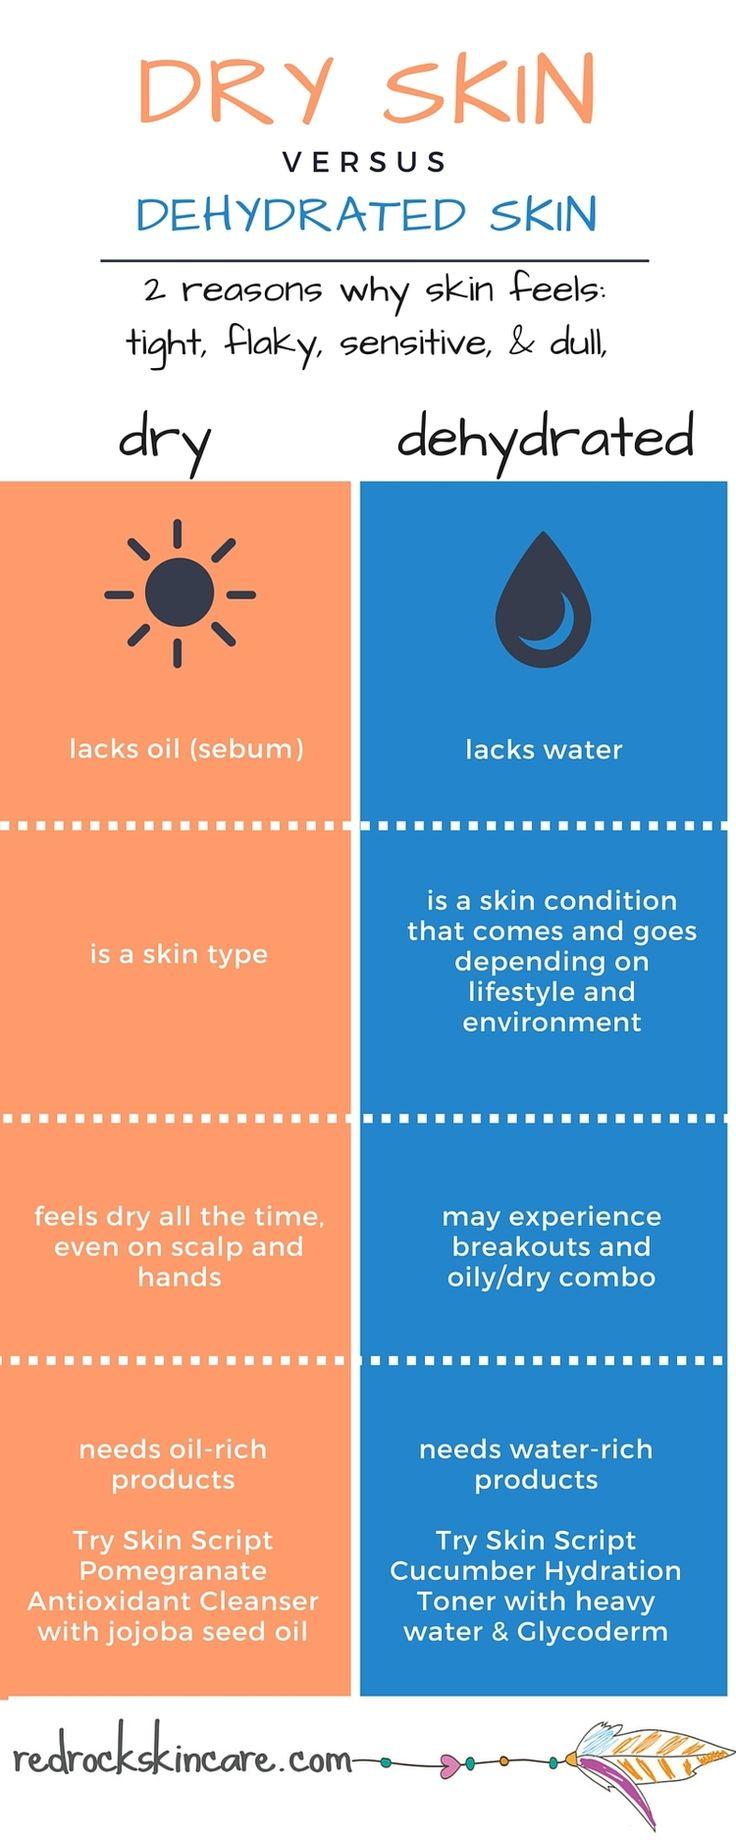 dry-skin-versus-dehydrated-skin